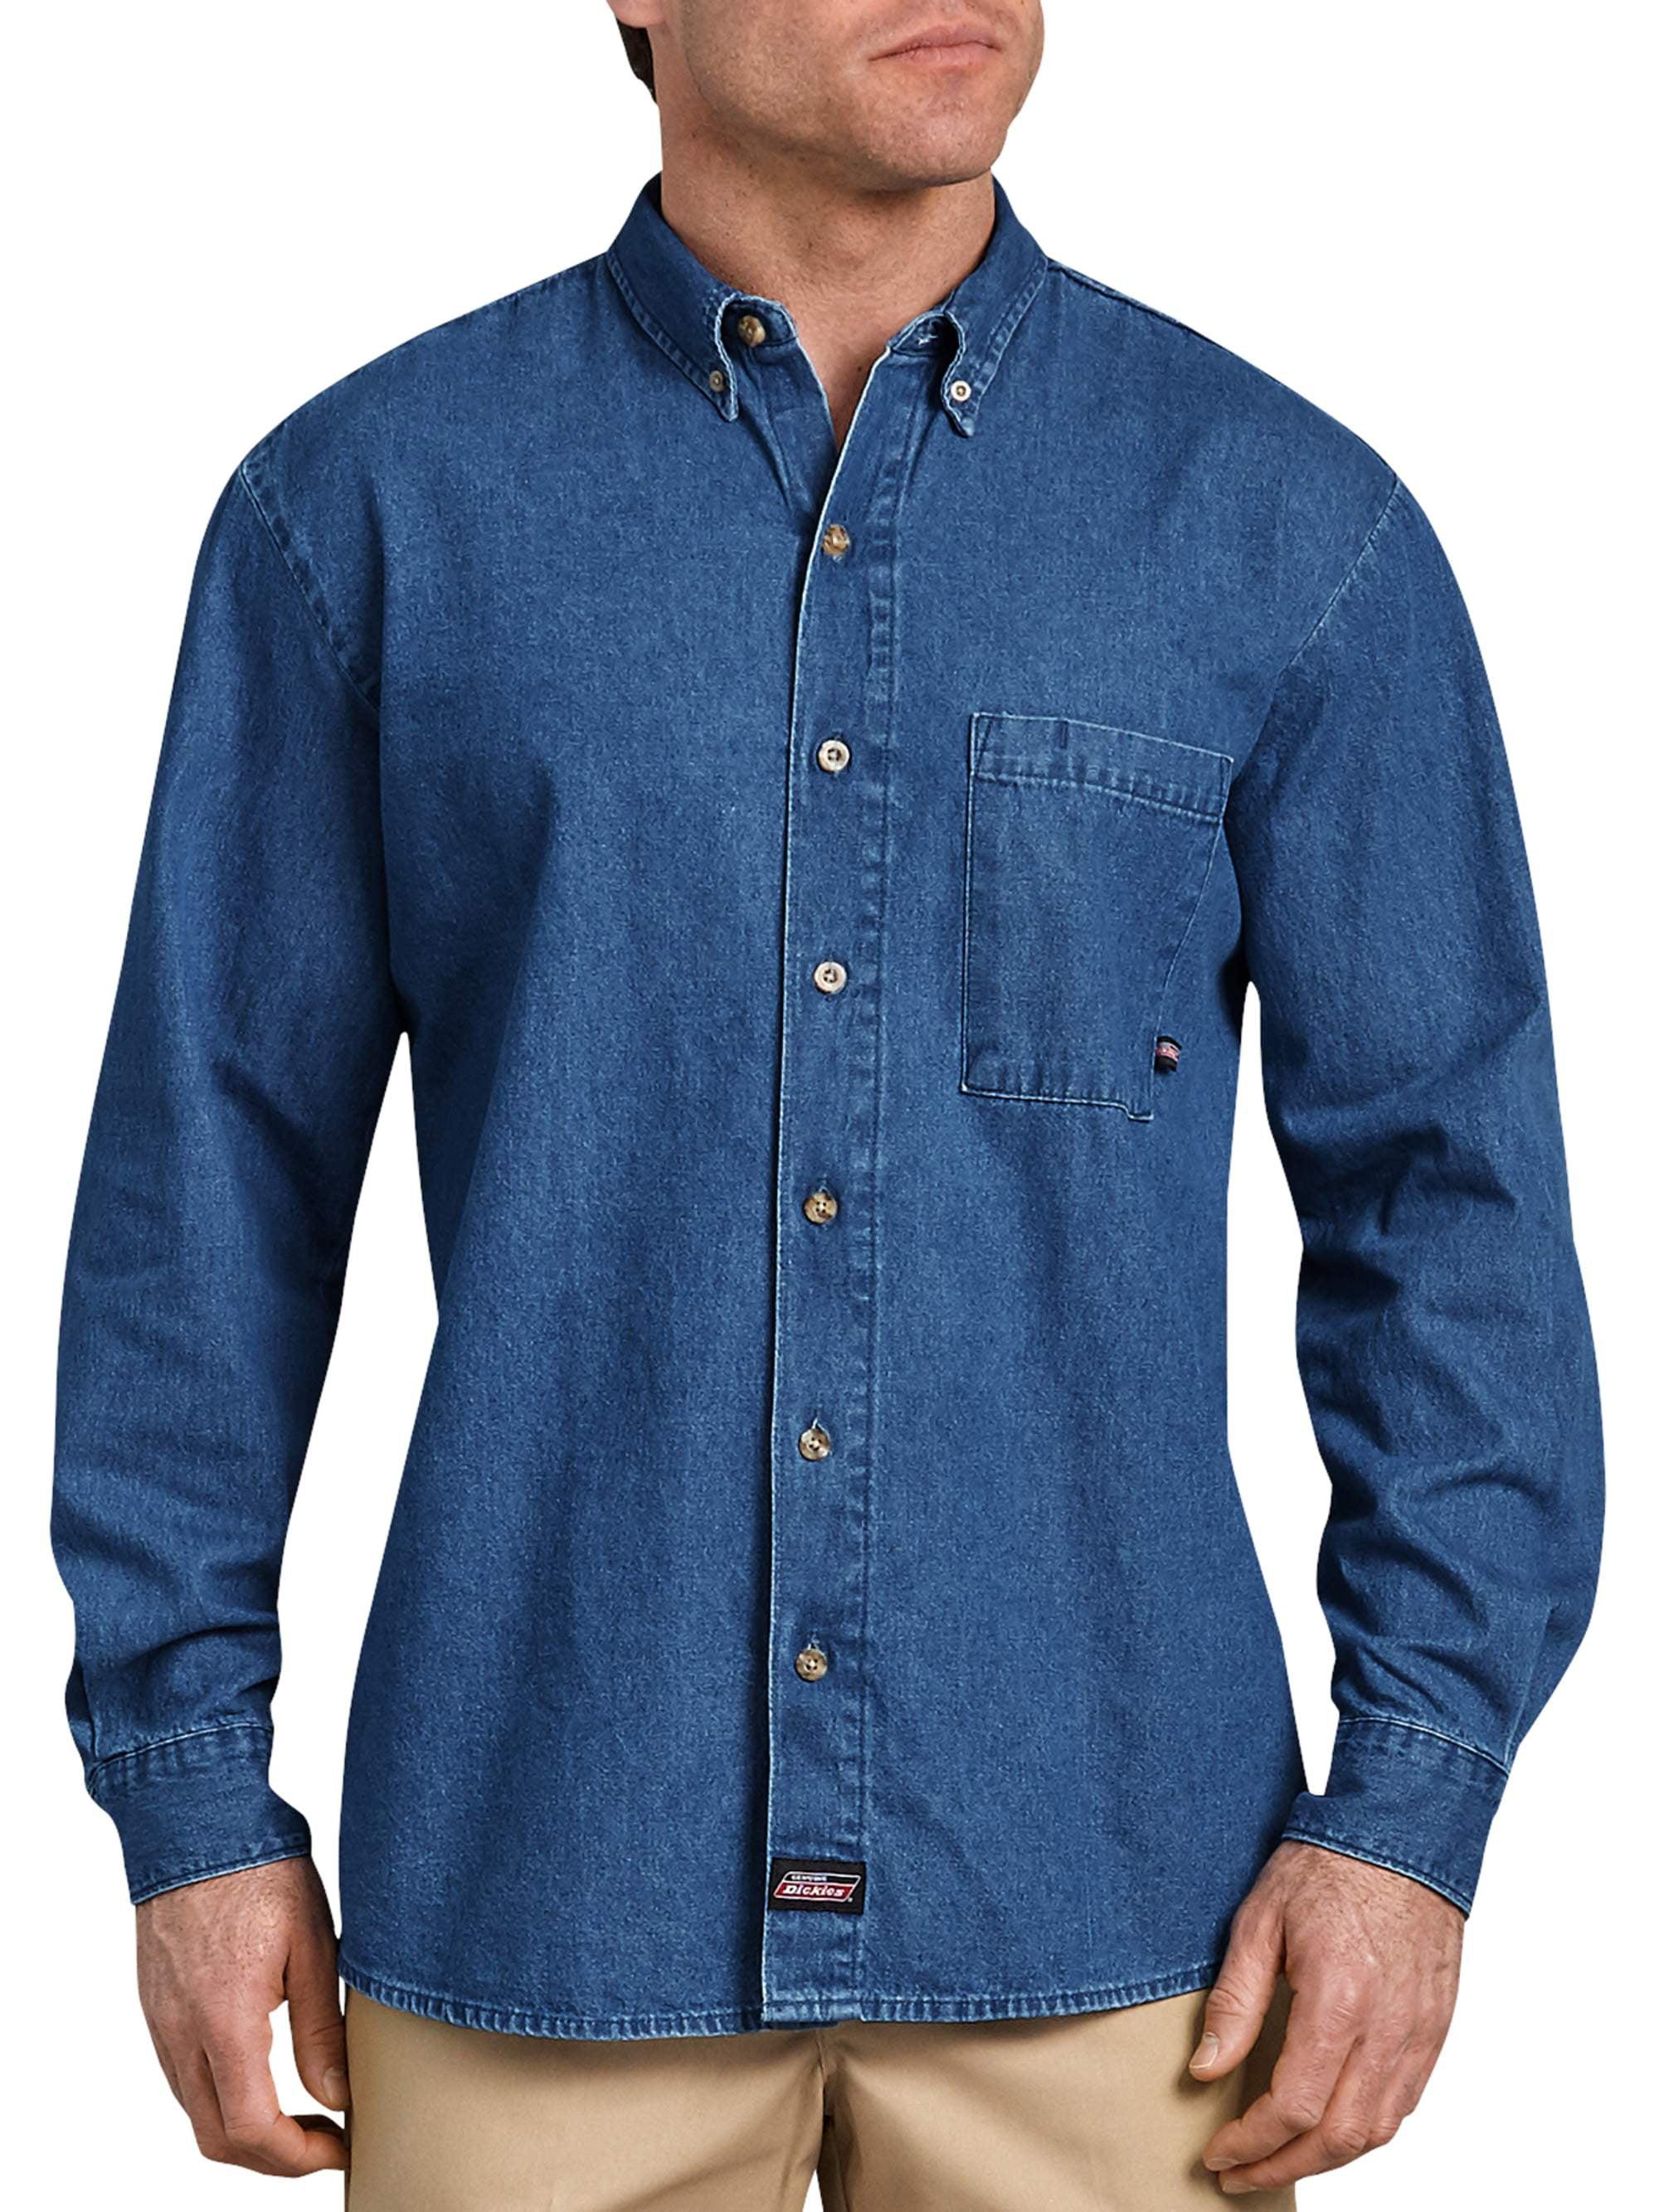 HERW Mens Comfortable Long-Sleeve Band-Collar Denim Shirt